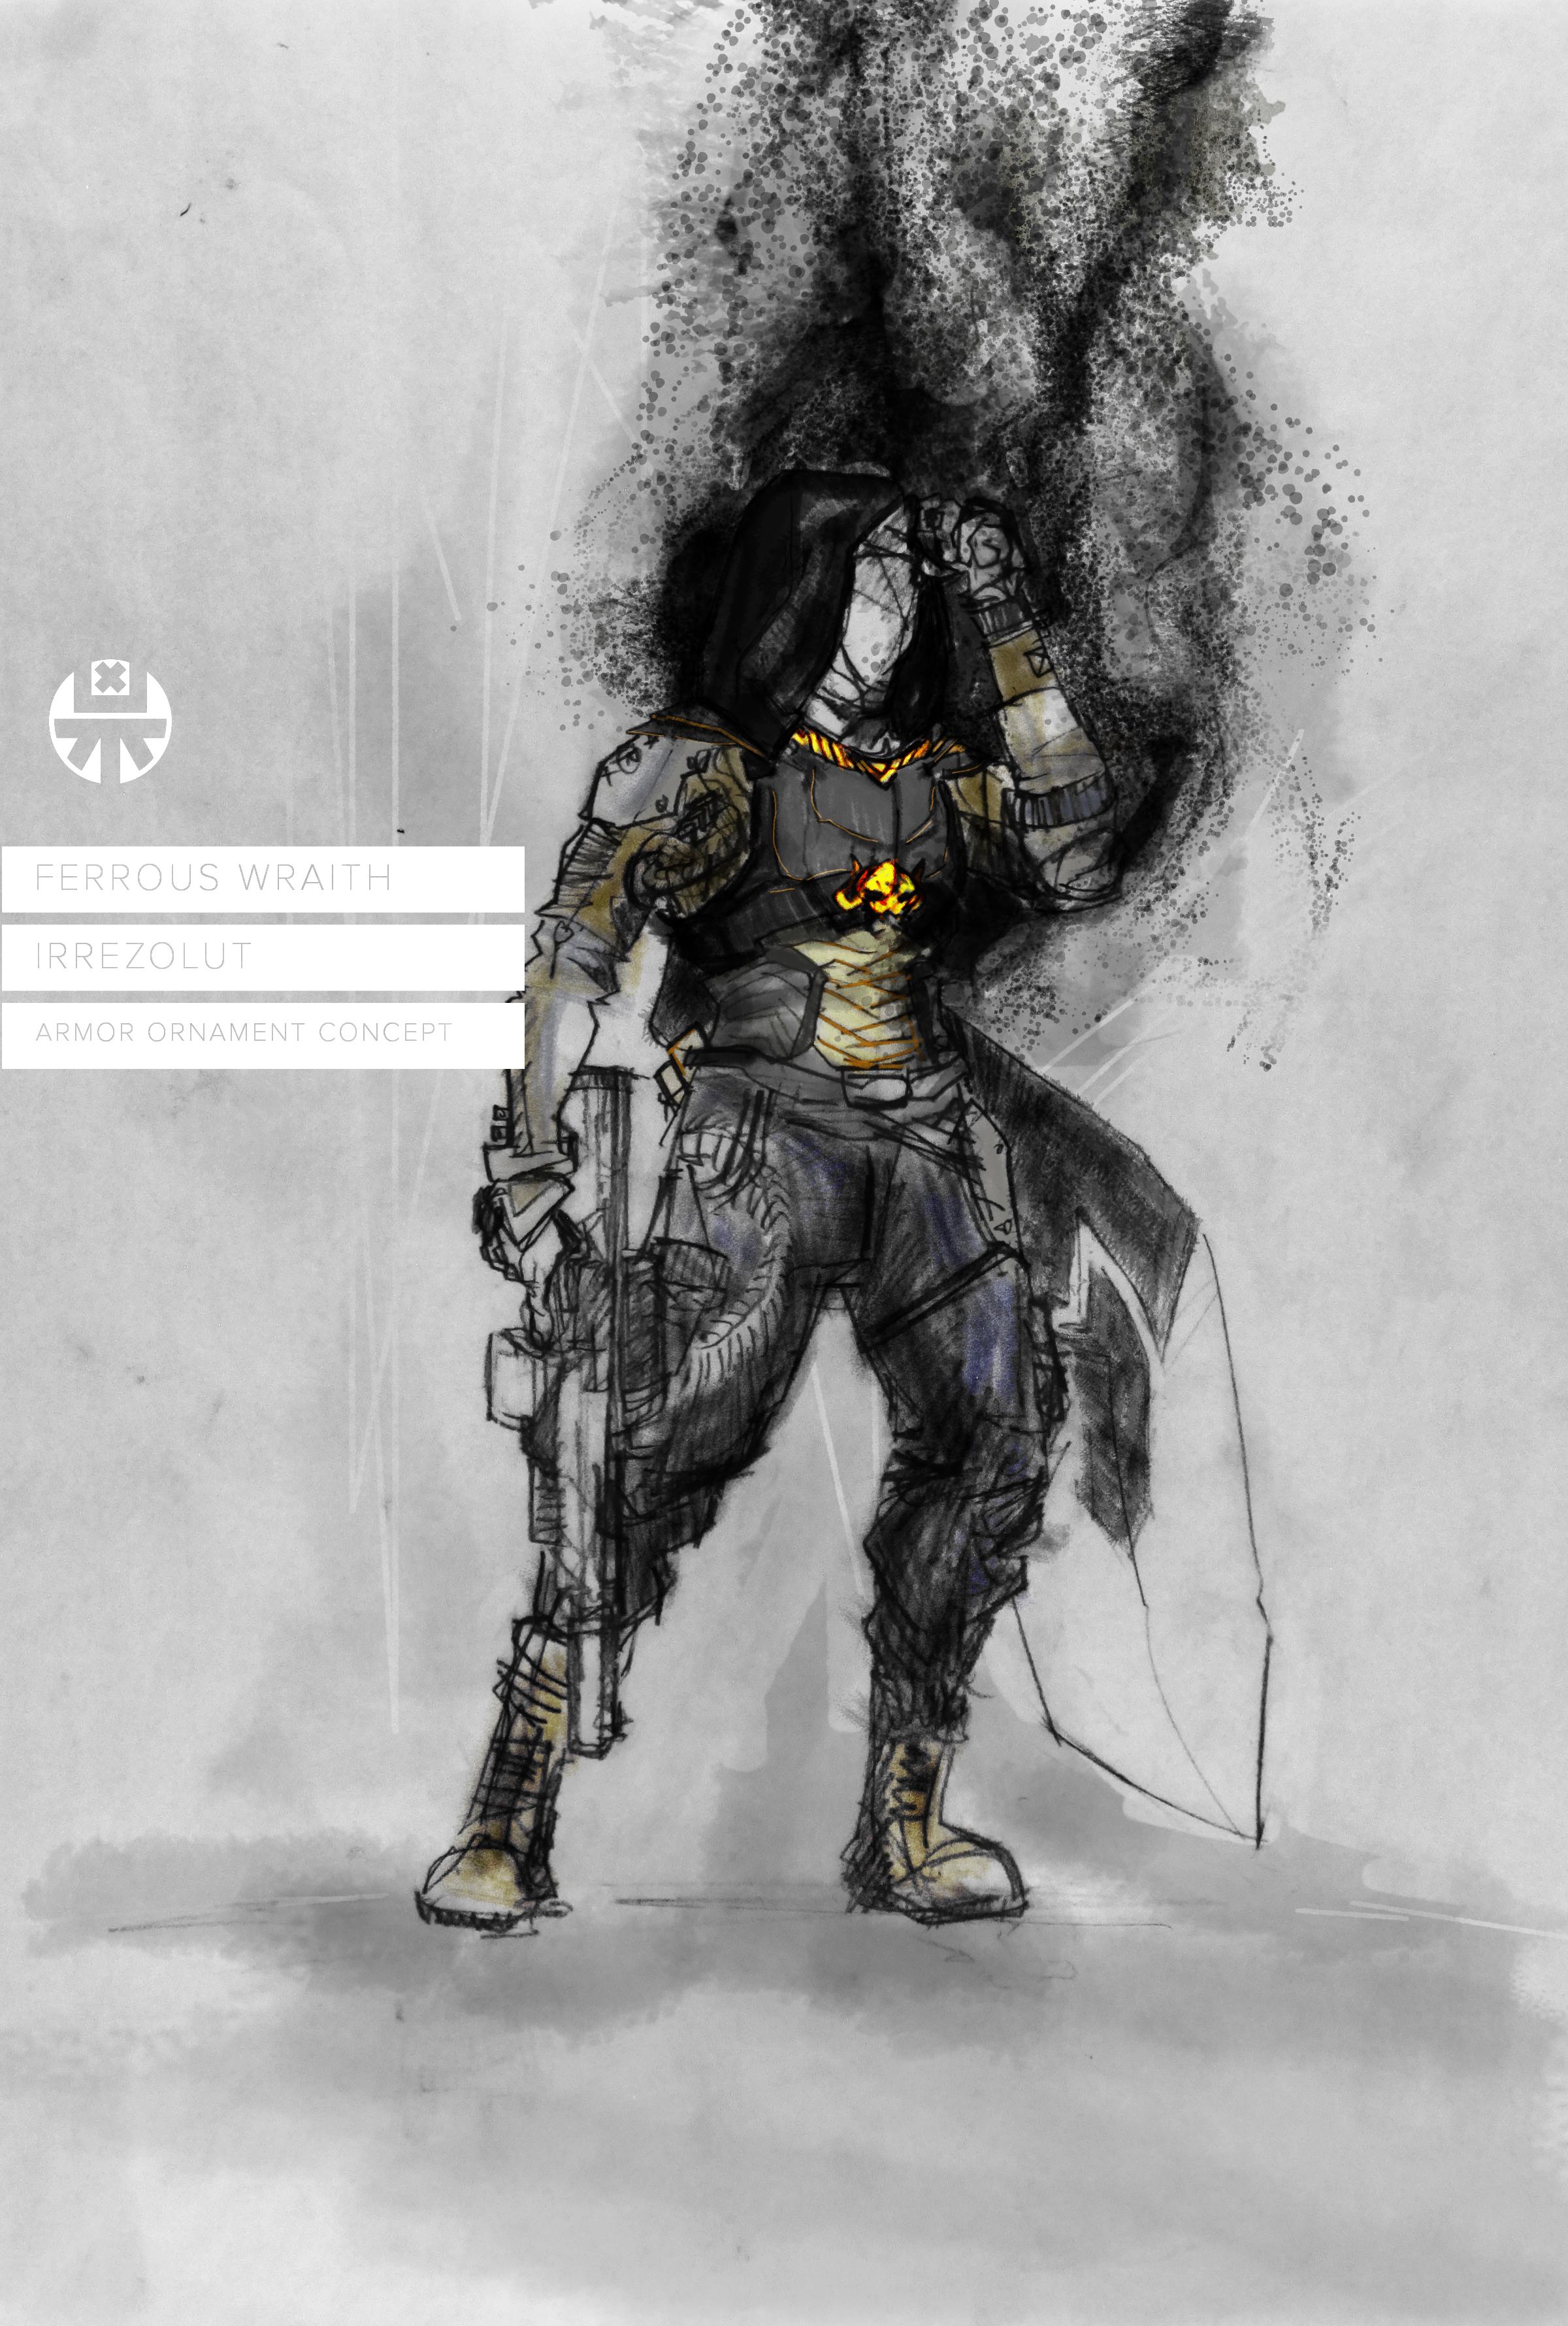 Ferrous Wraith